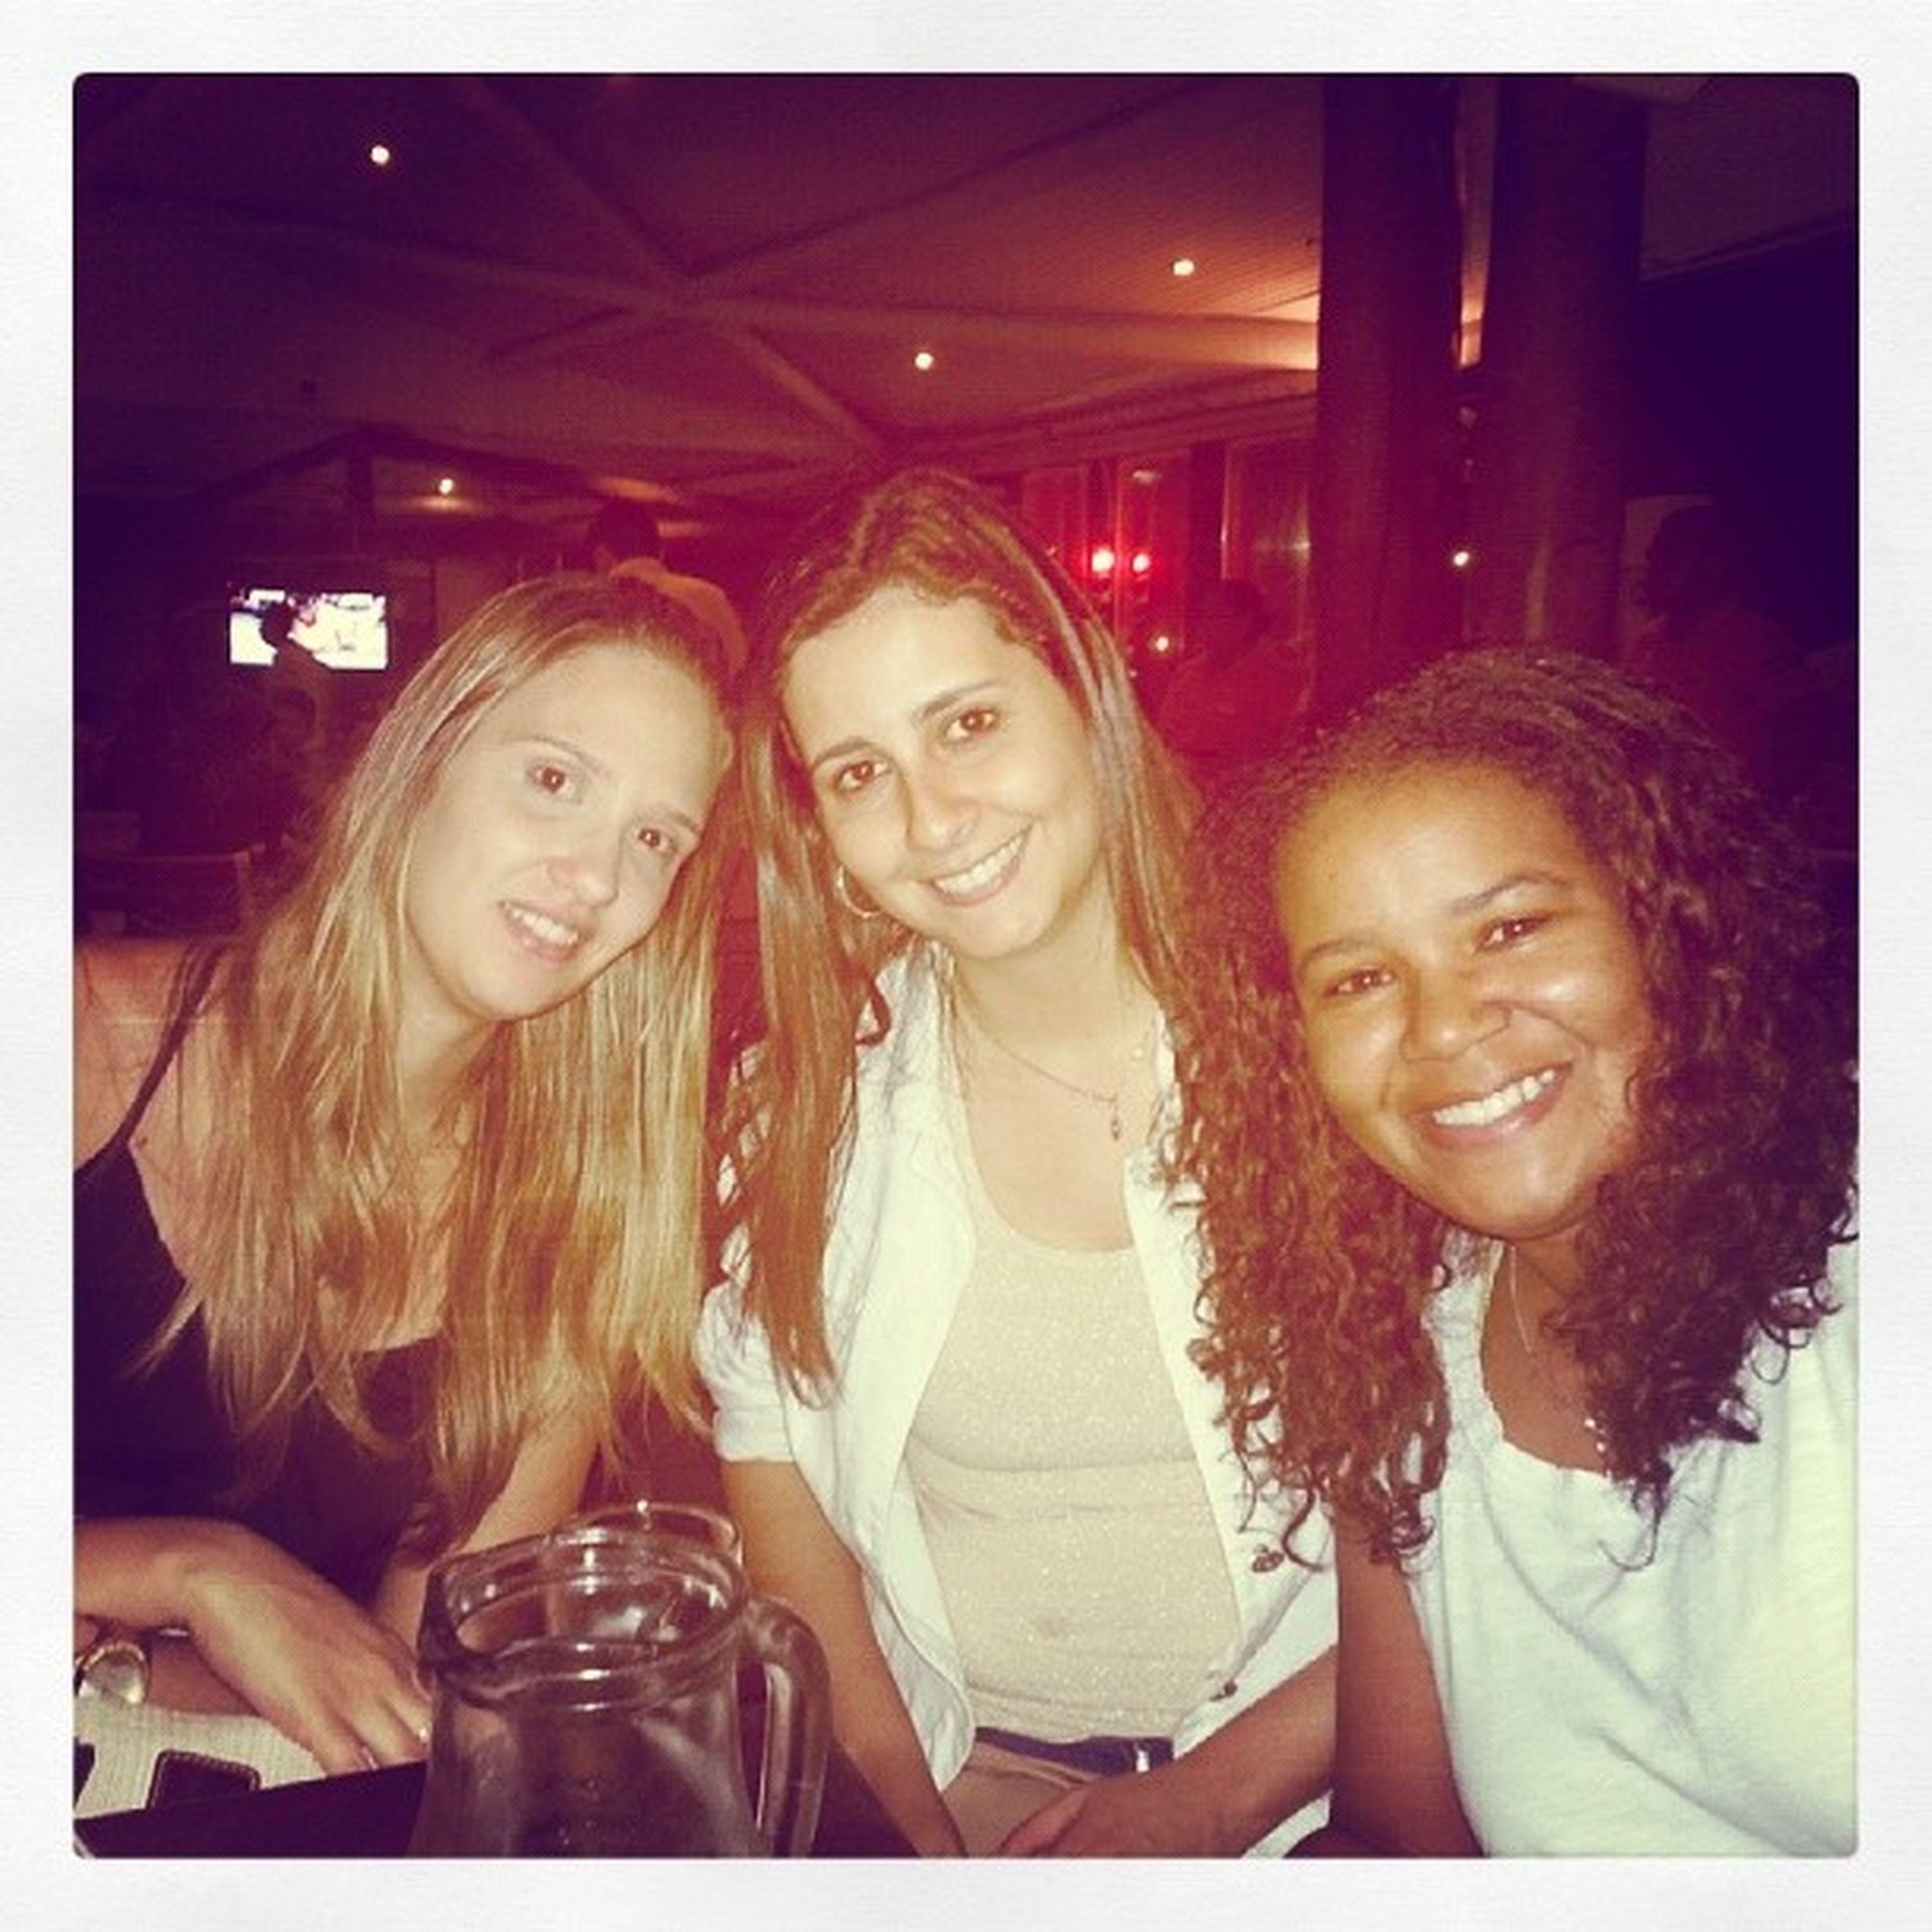 Irmandade  Amizade Sabadao Bombando ♥♥♥♥♥♥♥